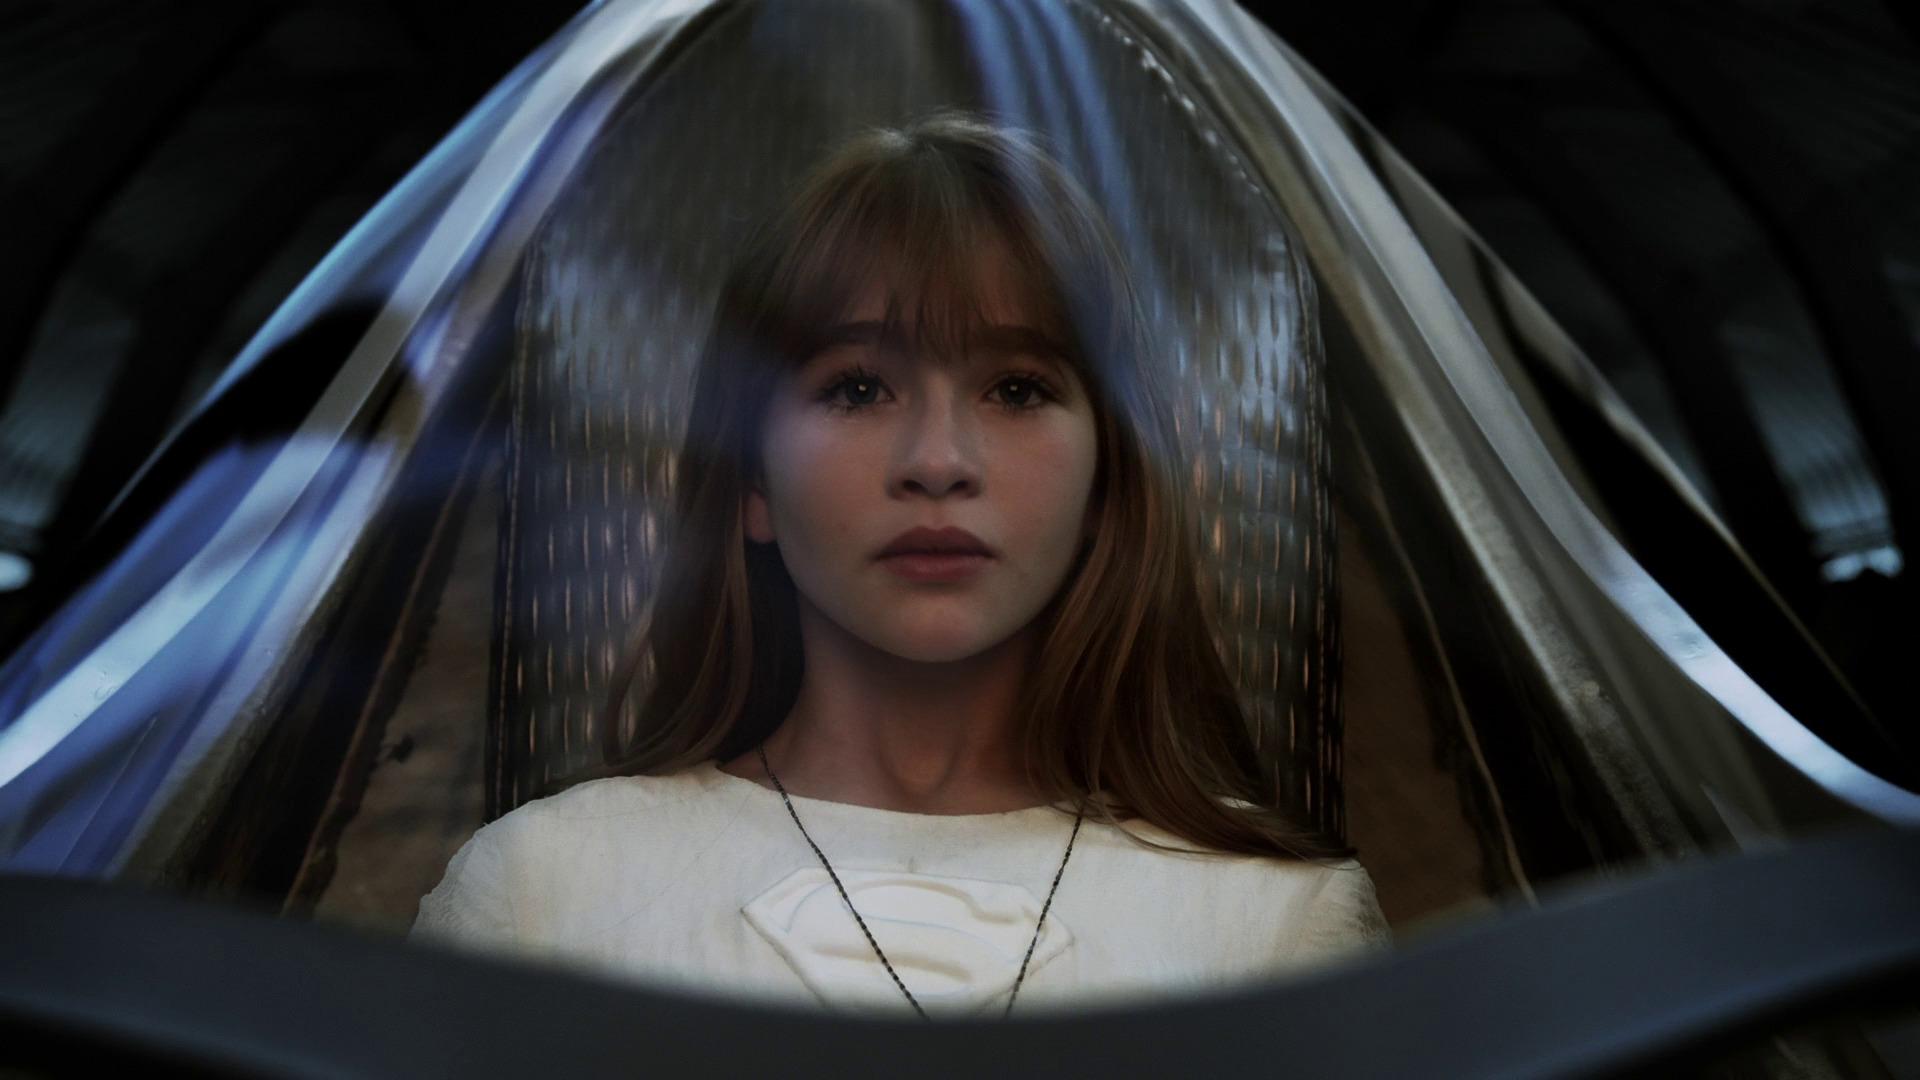 Kara_in_her_pod_preparing_to_be_rocketed_away_from_Krypton.jpg